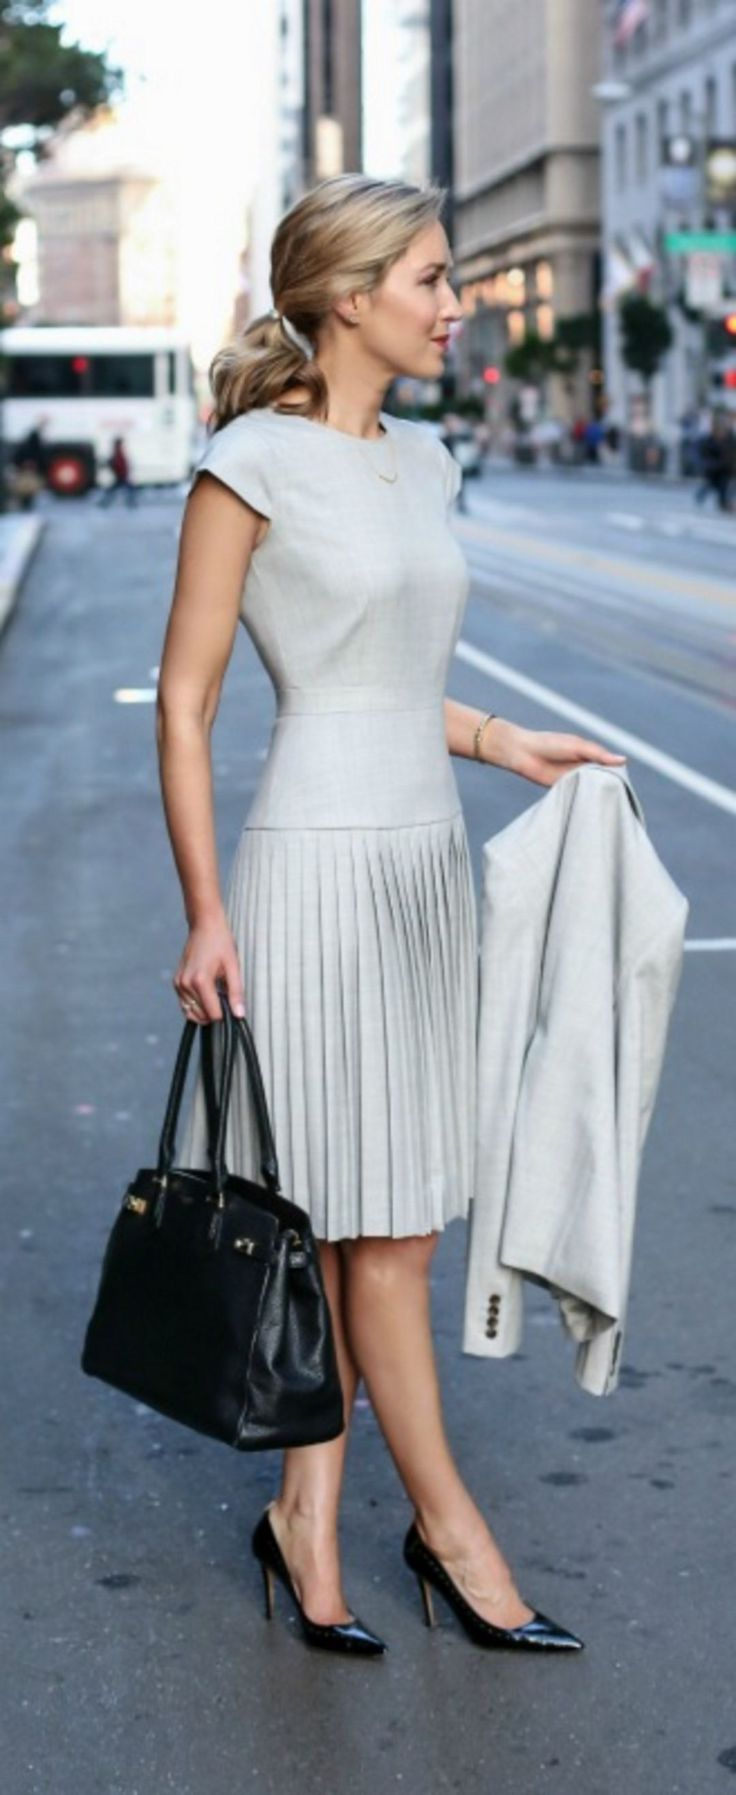 Best 25+ Classic Fashion Style Ideas On Pinterest